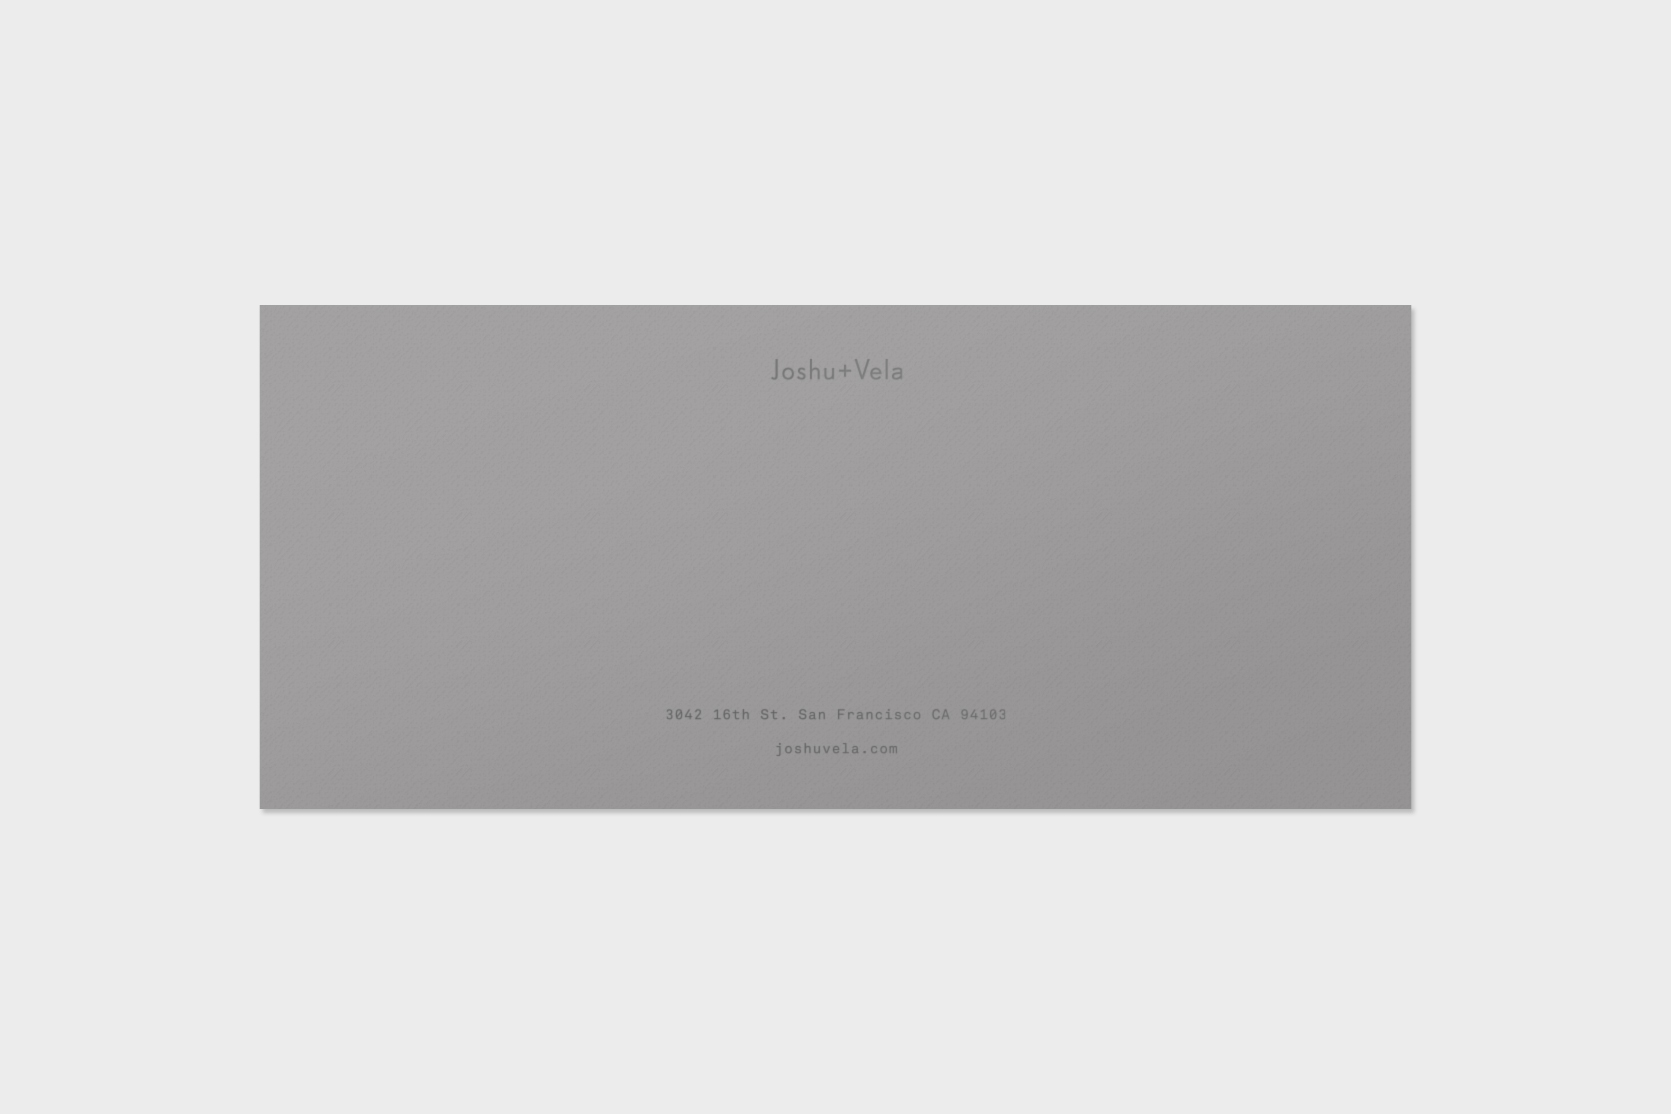 Julia-Kostreva-Studio-Branding-Joshu-Vela--Buckslip-Stationery-letterpress-1.jpg